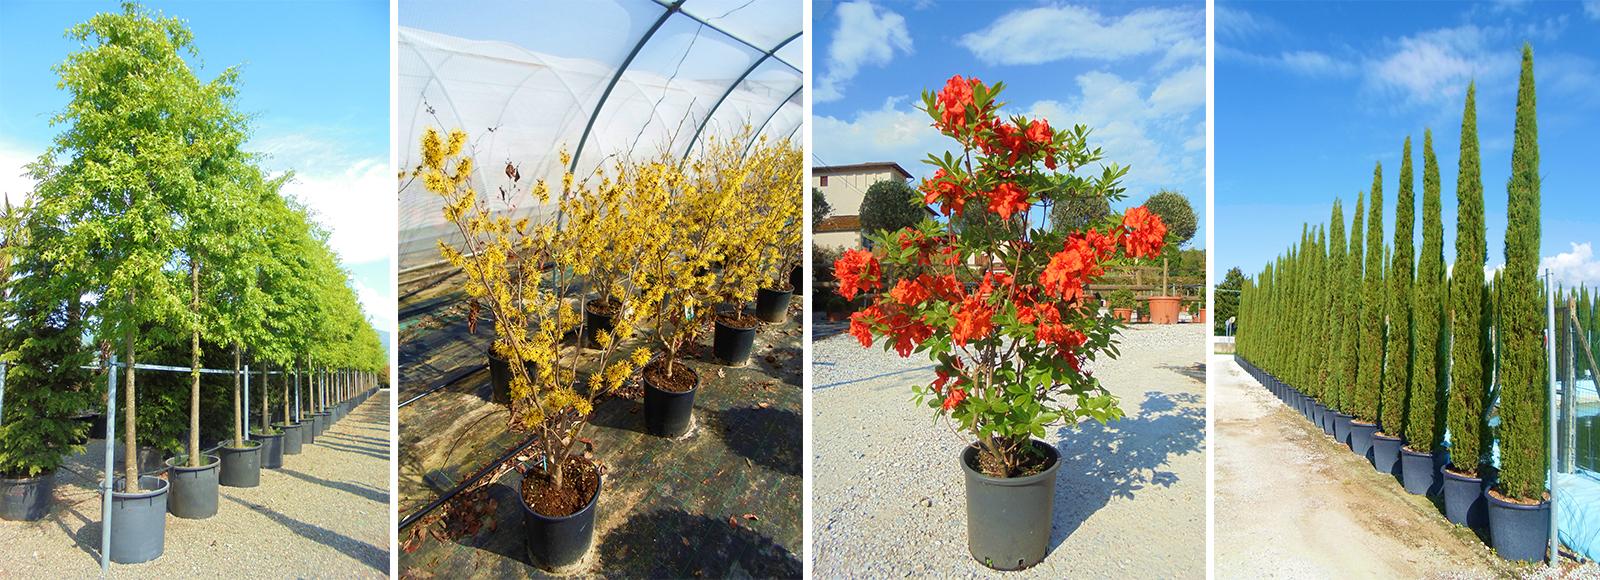 Zini piante vivai piante pepinieres baumschuler nurseries for Vivai a pistoia